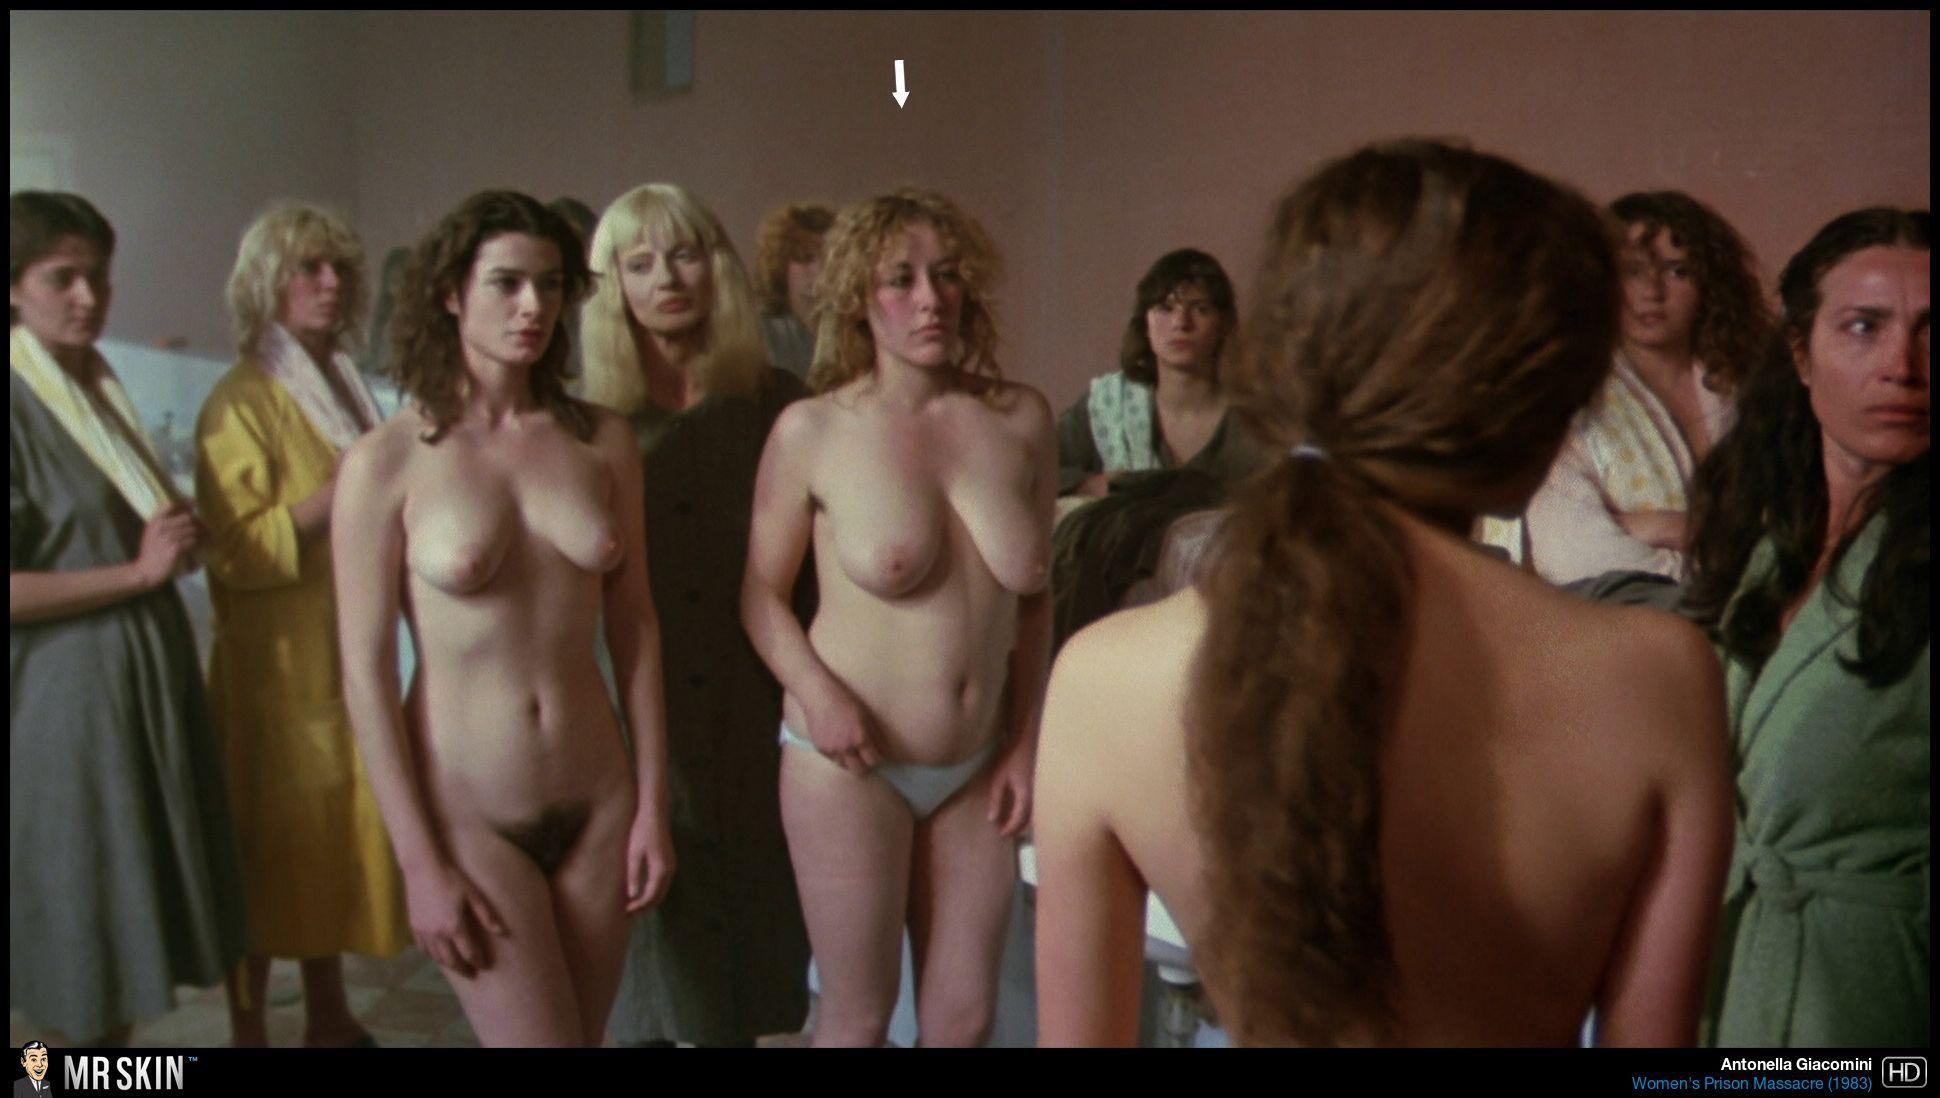 Maria romano lorraine de sellenude 1983 - 3 part 6